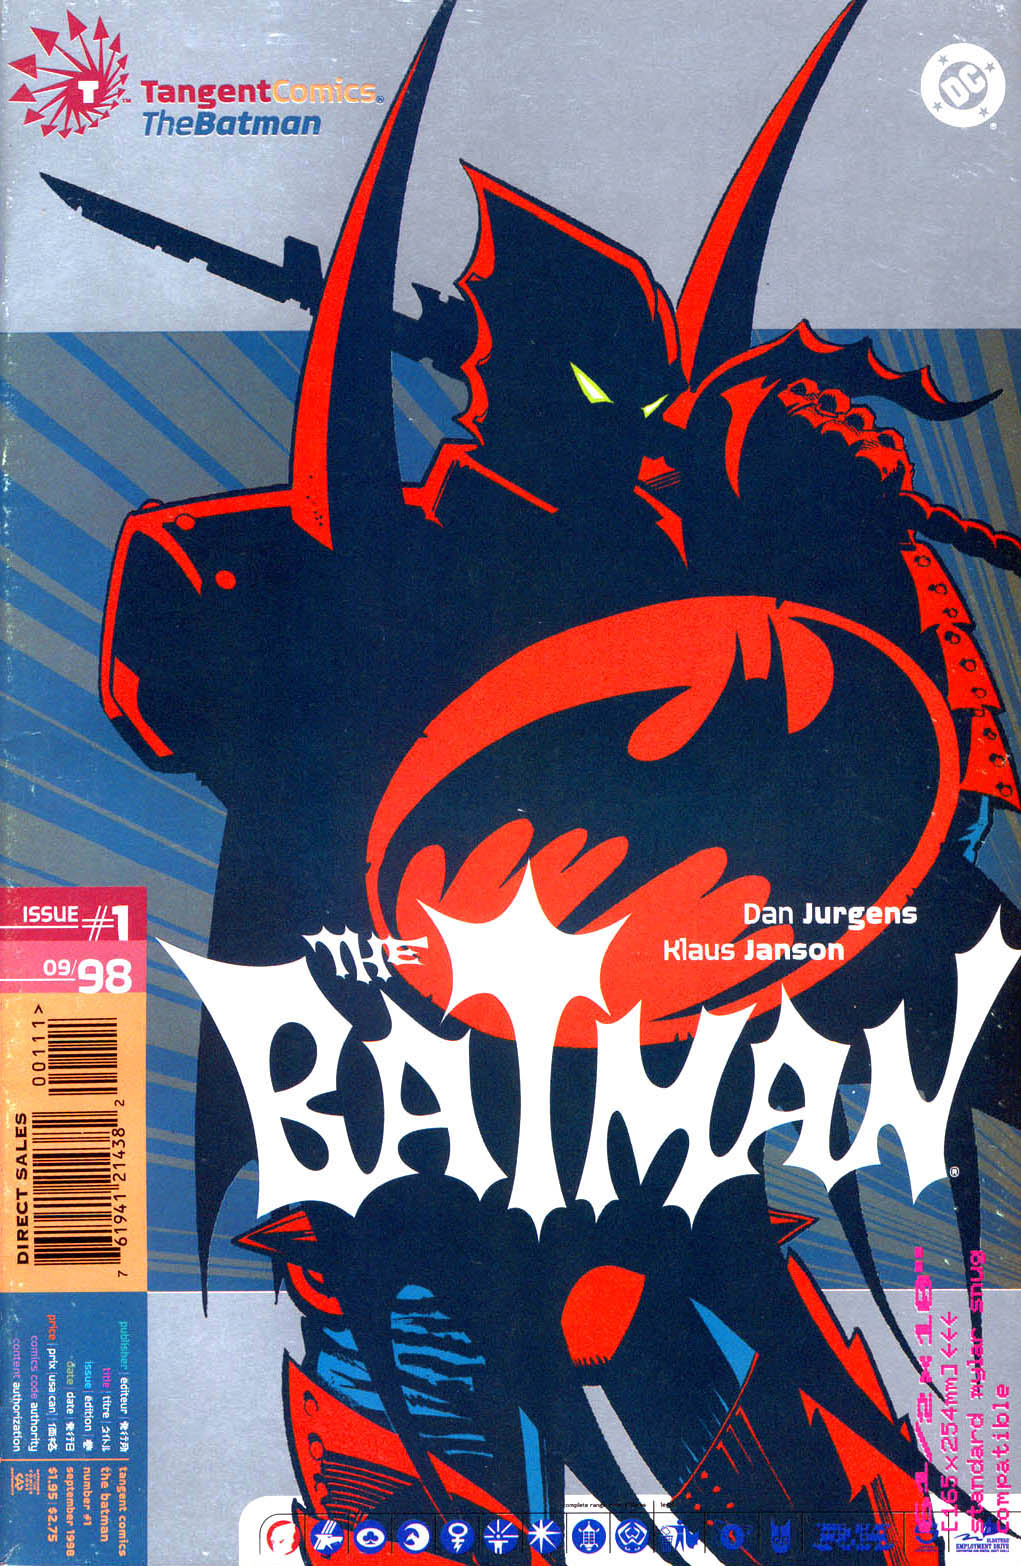 Tangent Comics/ The Batman Full Page 1